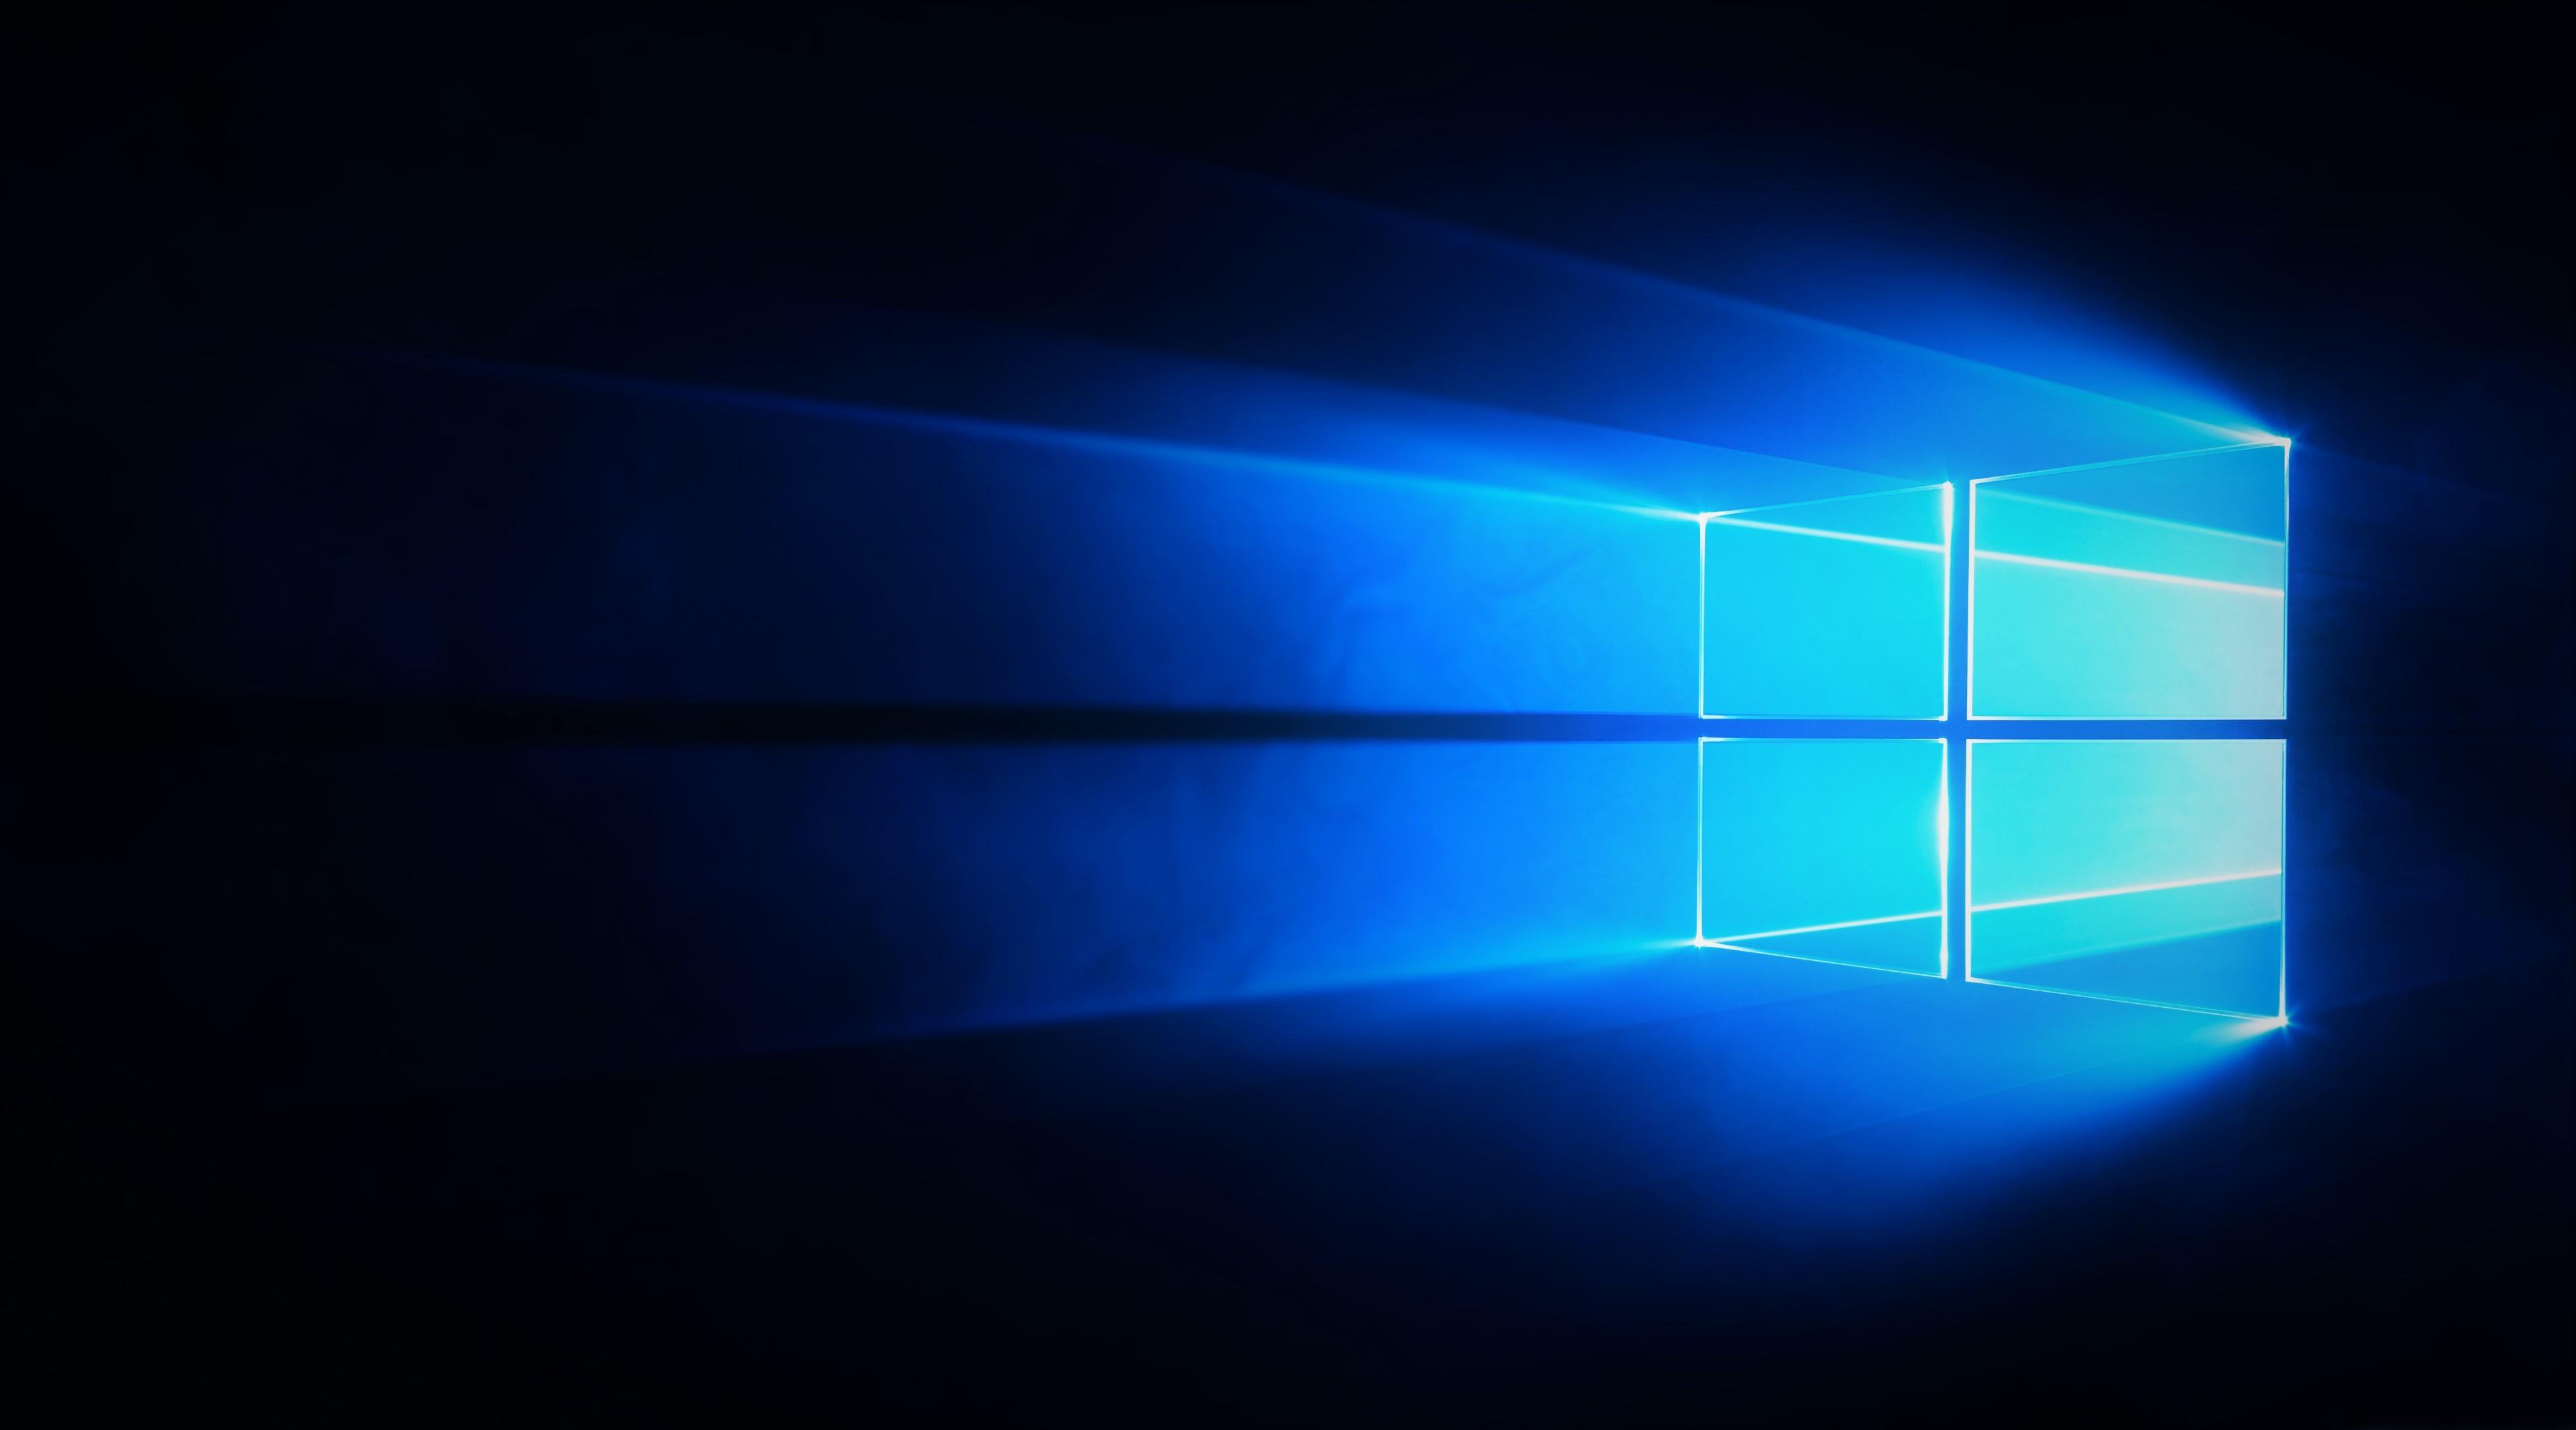 Alternative Windows 10 wallpaper, by me …